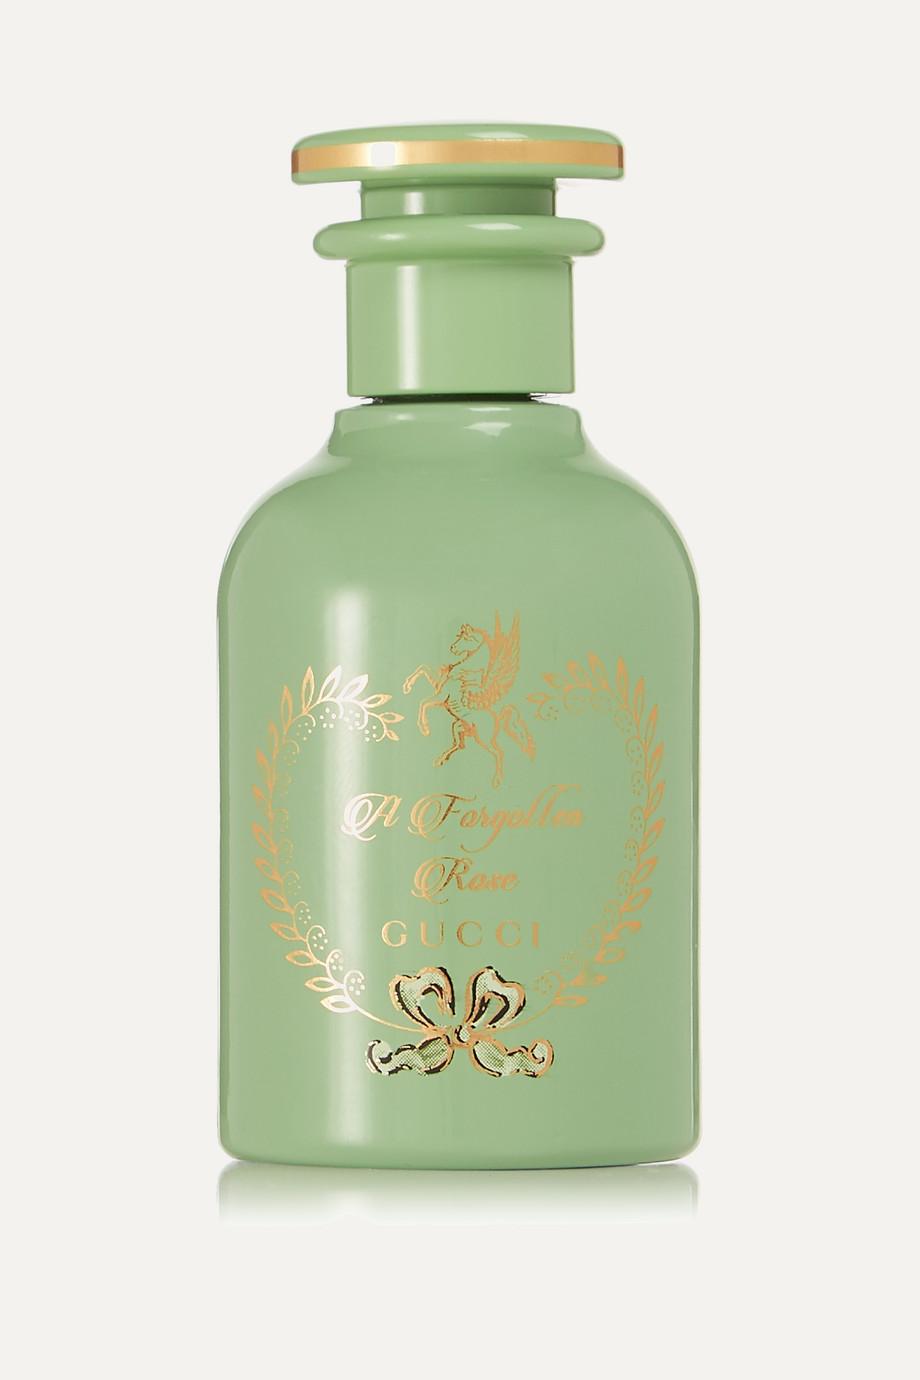 Gucci Beauty Gucci: The Alchemist's Garden - A Forgotten Rose Perfume Oil, 20ml